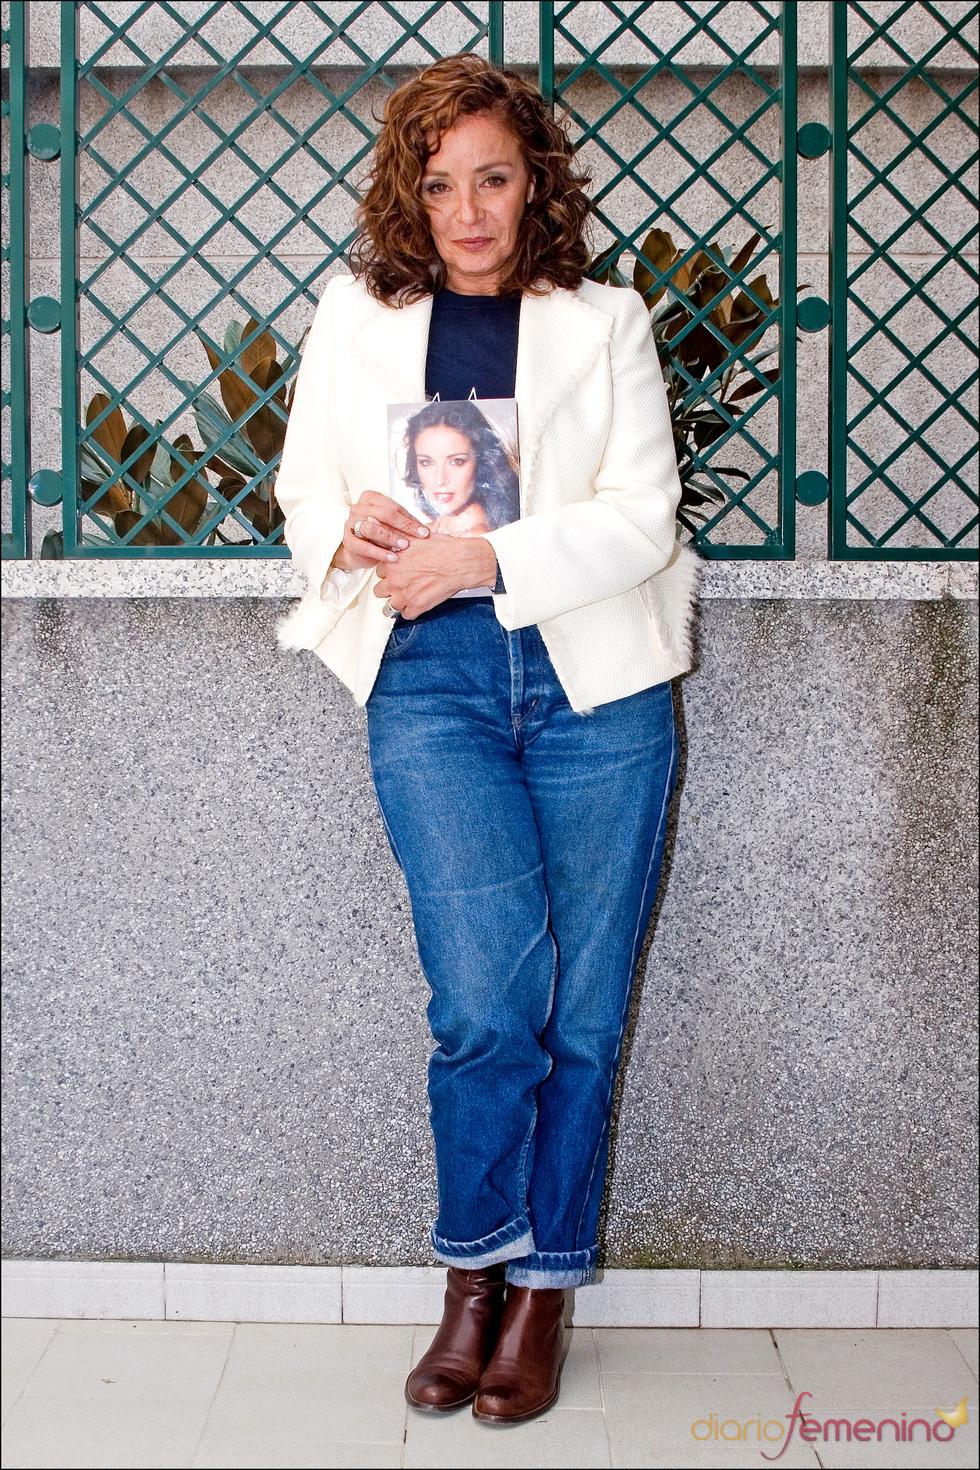 Muere Amparo Muñoz, la primera española Miss Universo